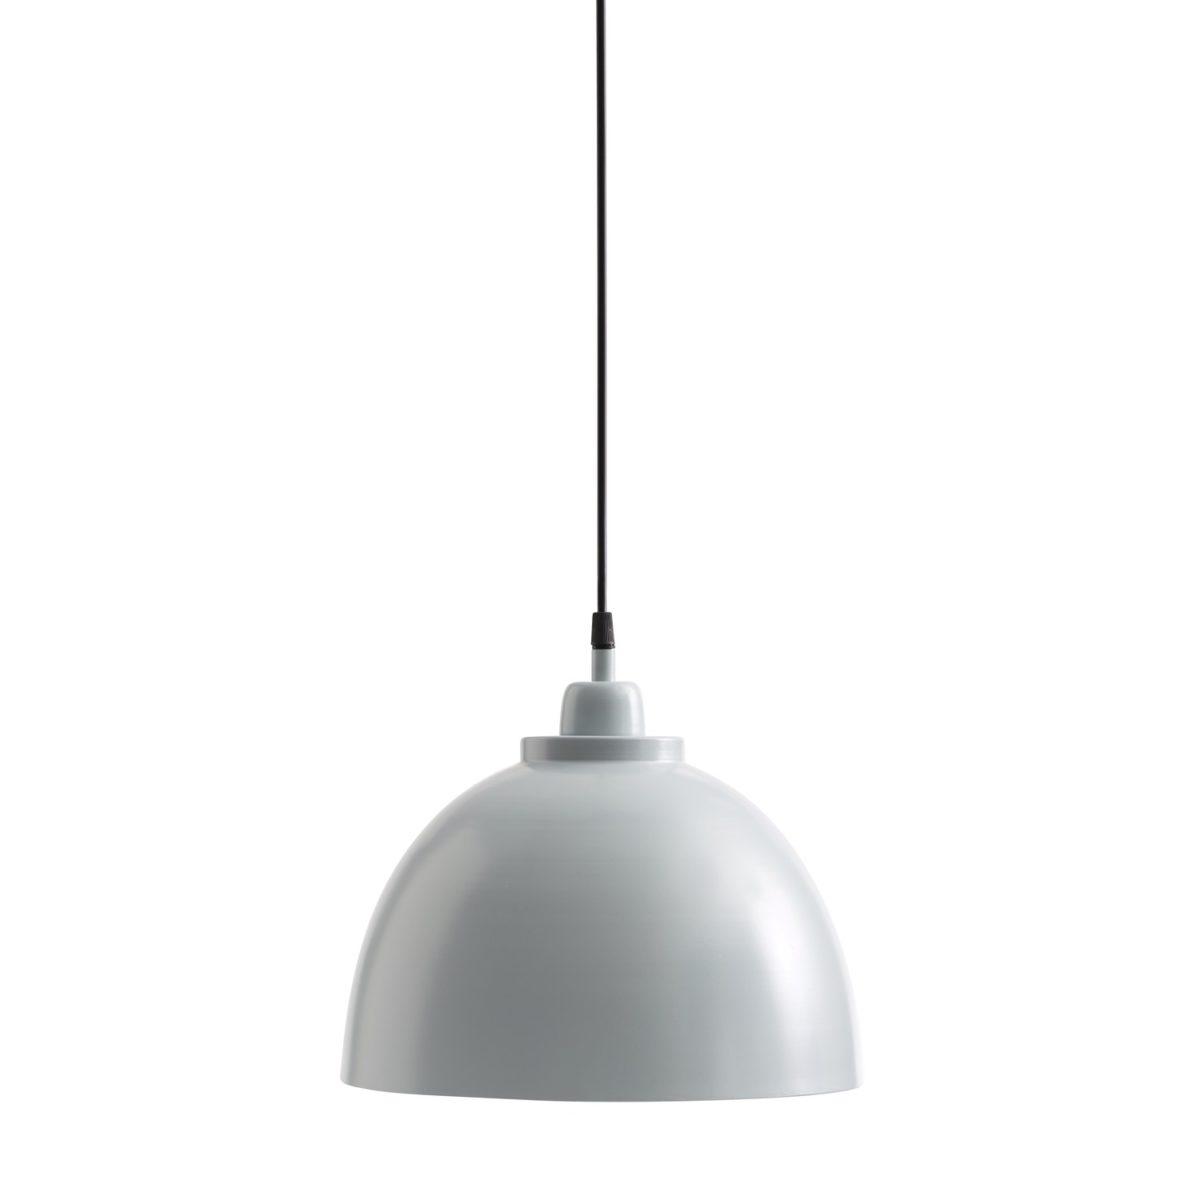 Deckenlampe Metall blaugrau Ø 30cm